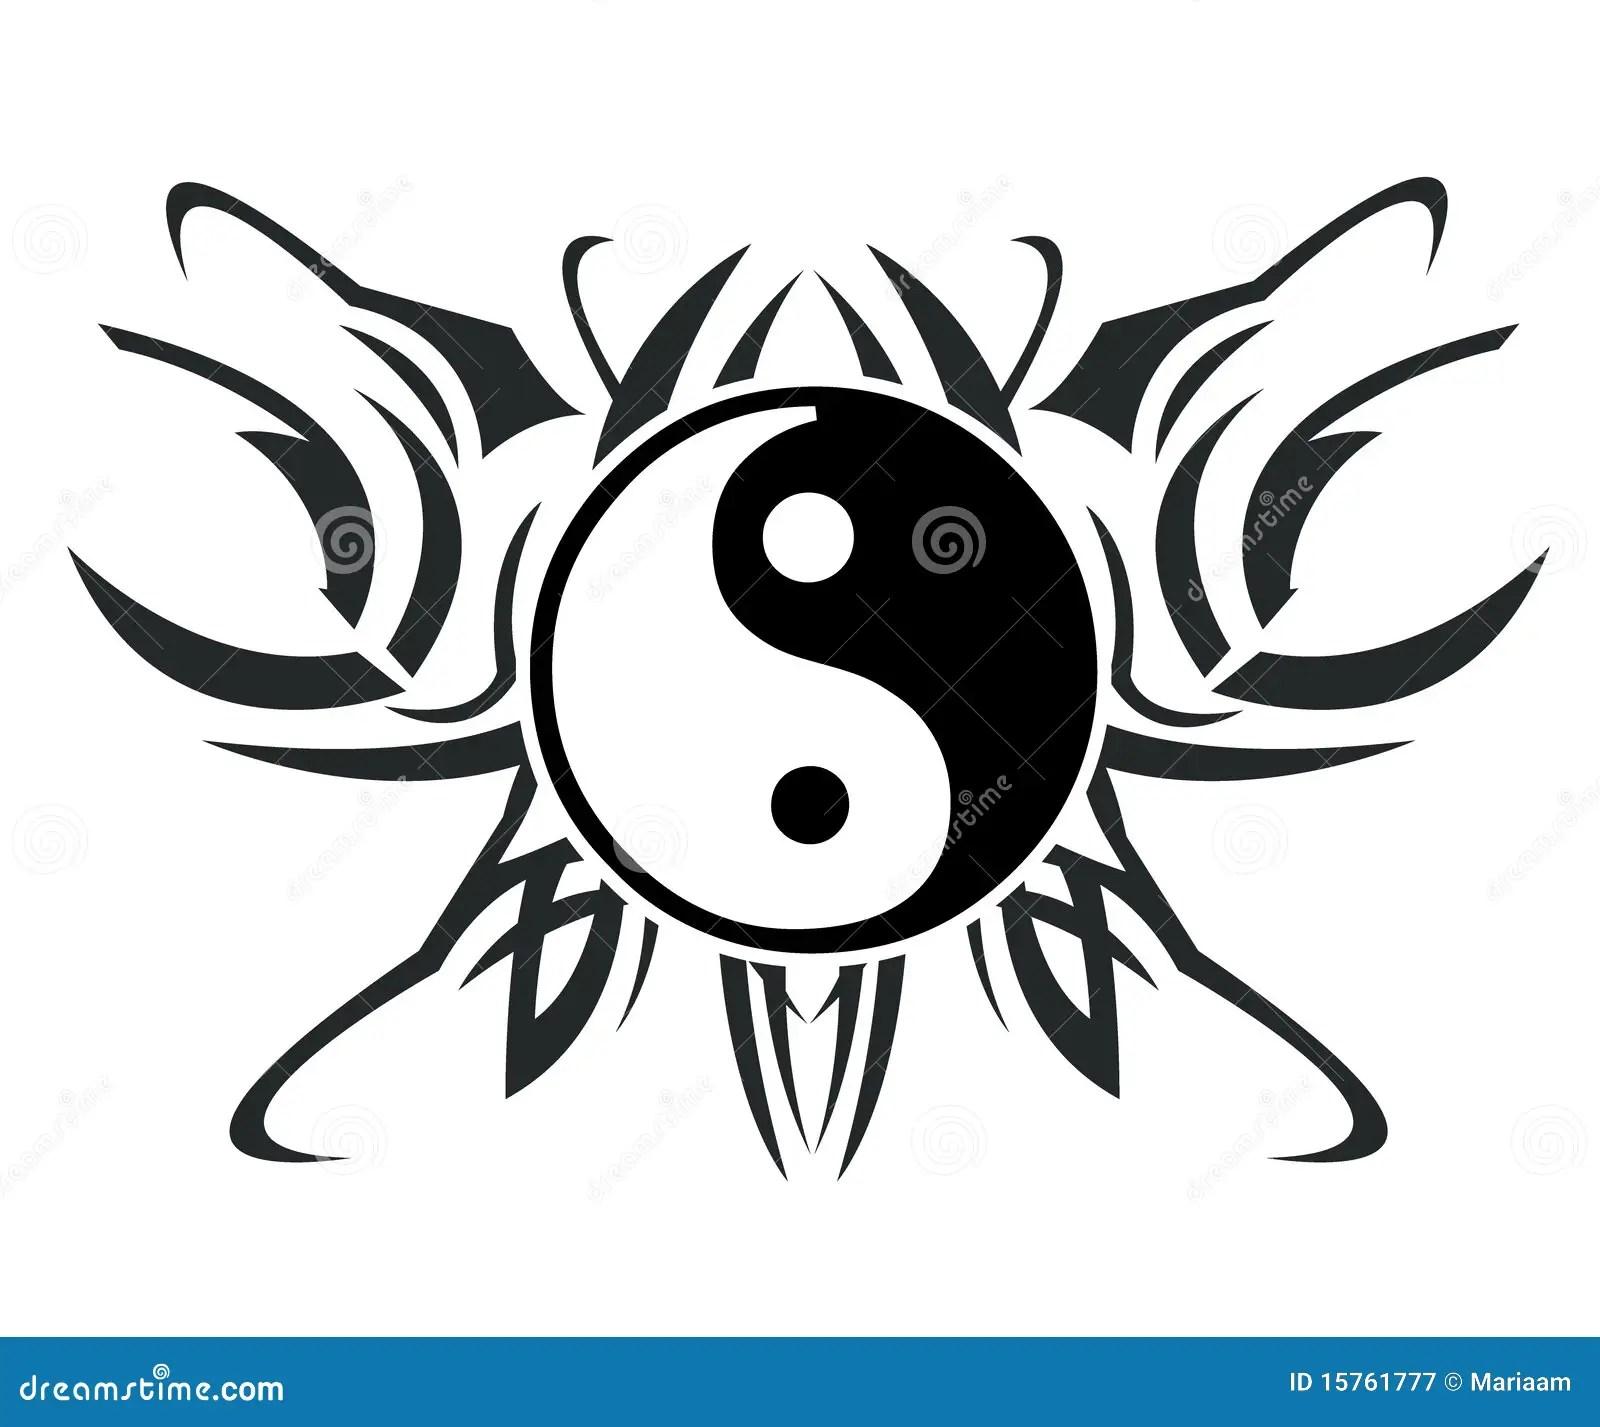 Yin Amp Yang Tatoegering Stock Illustratie Illustratie